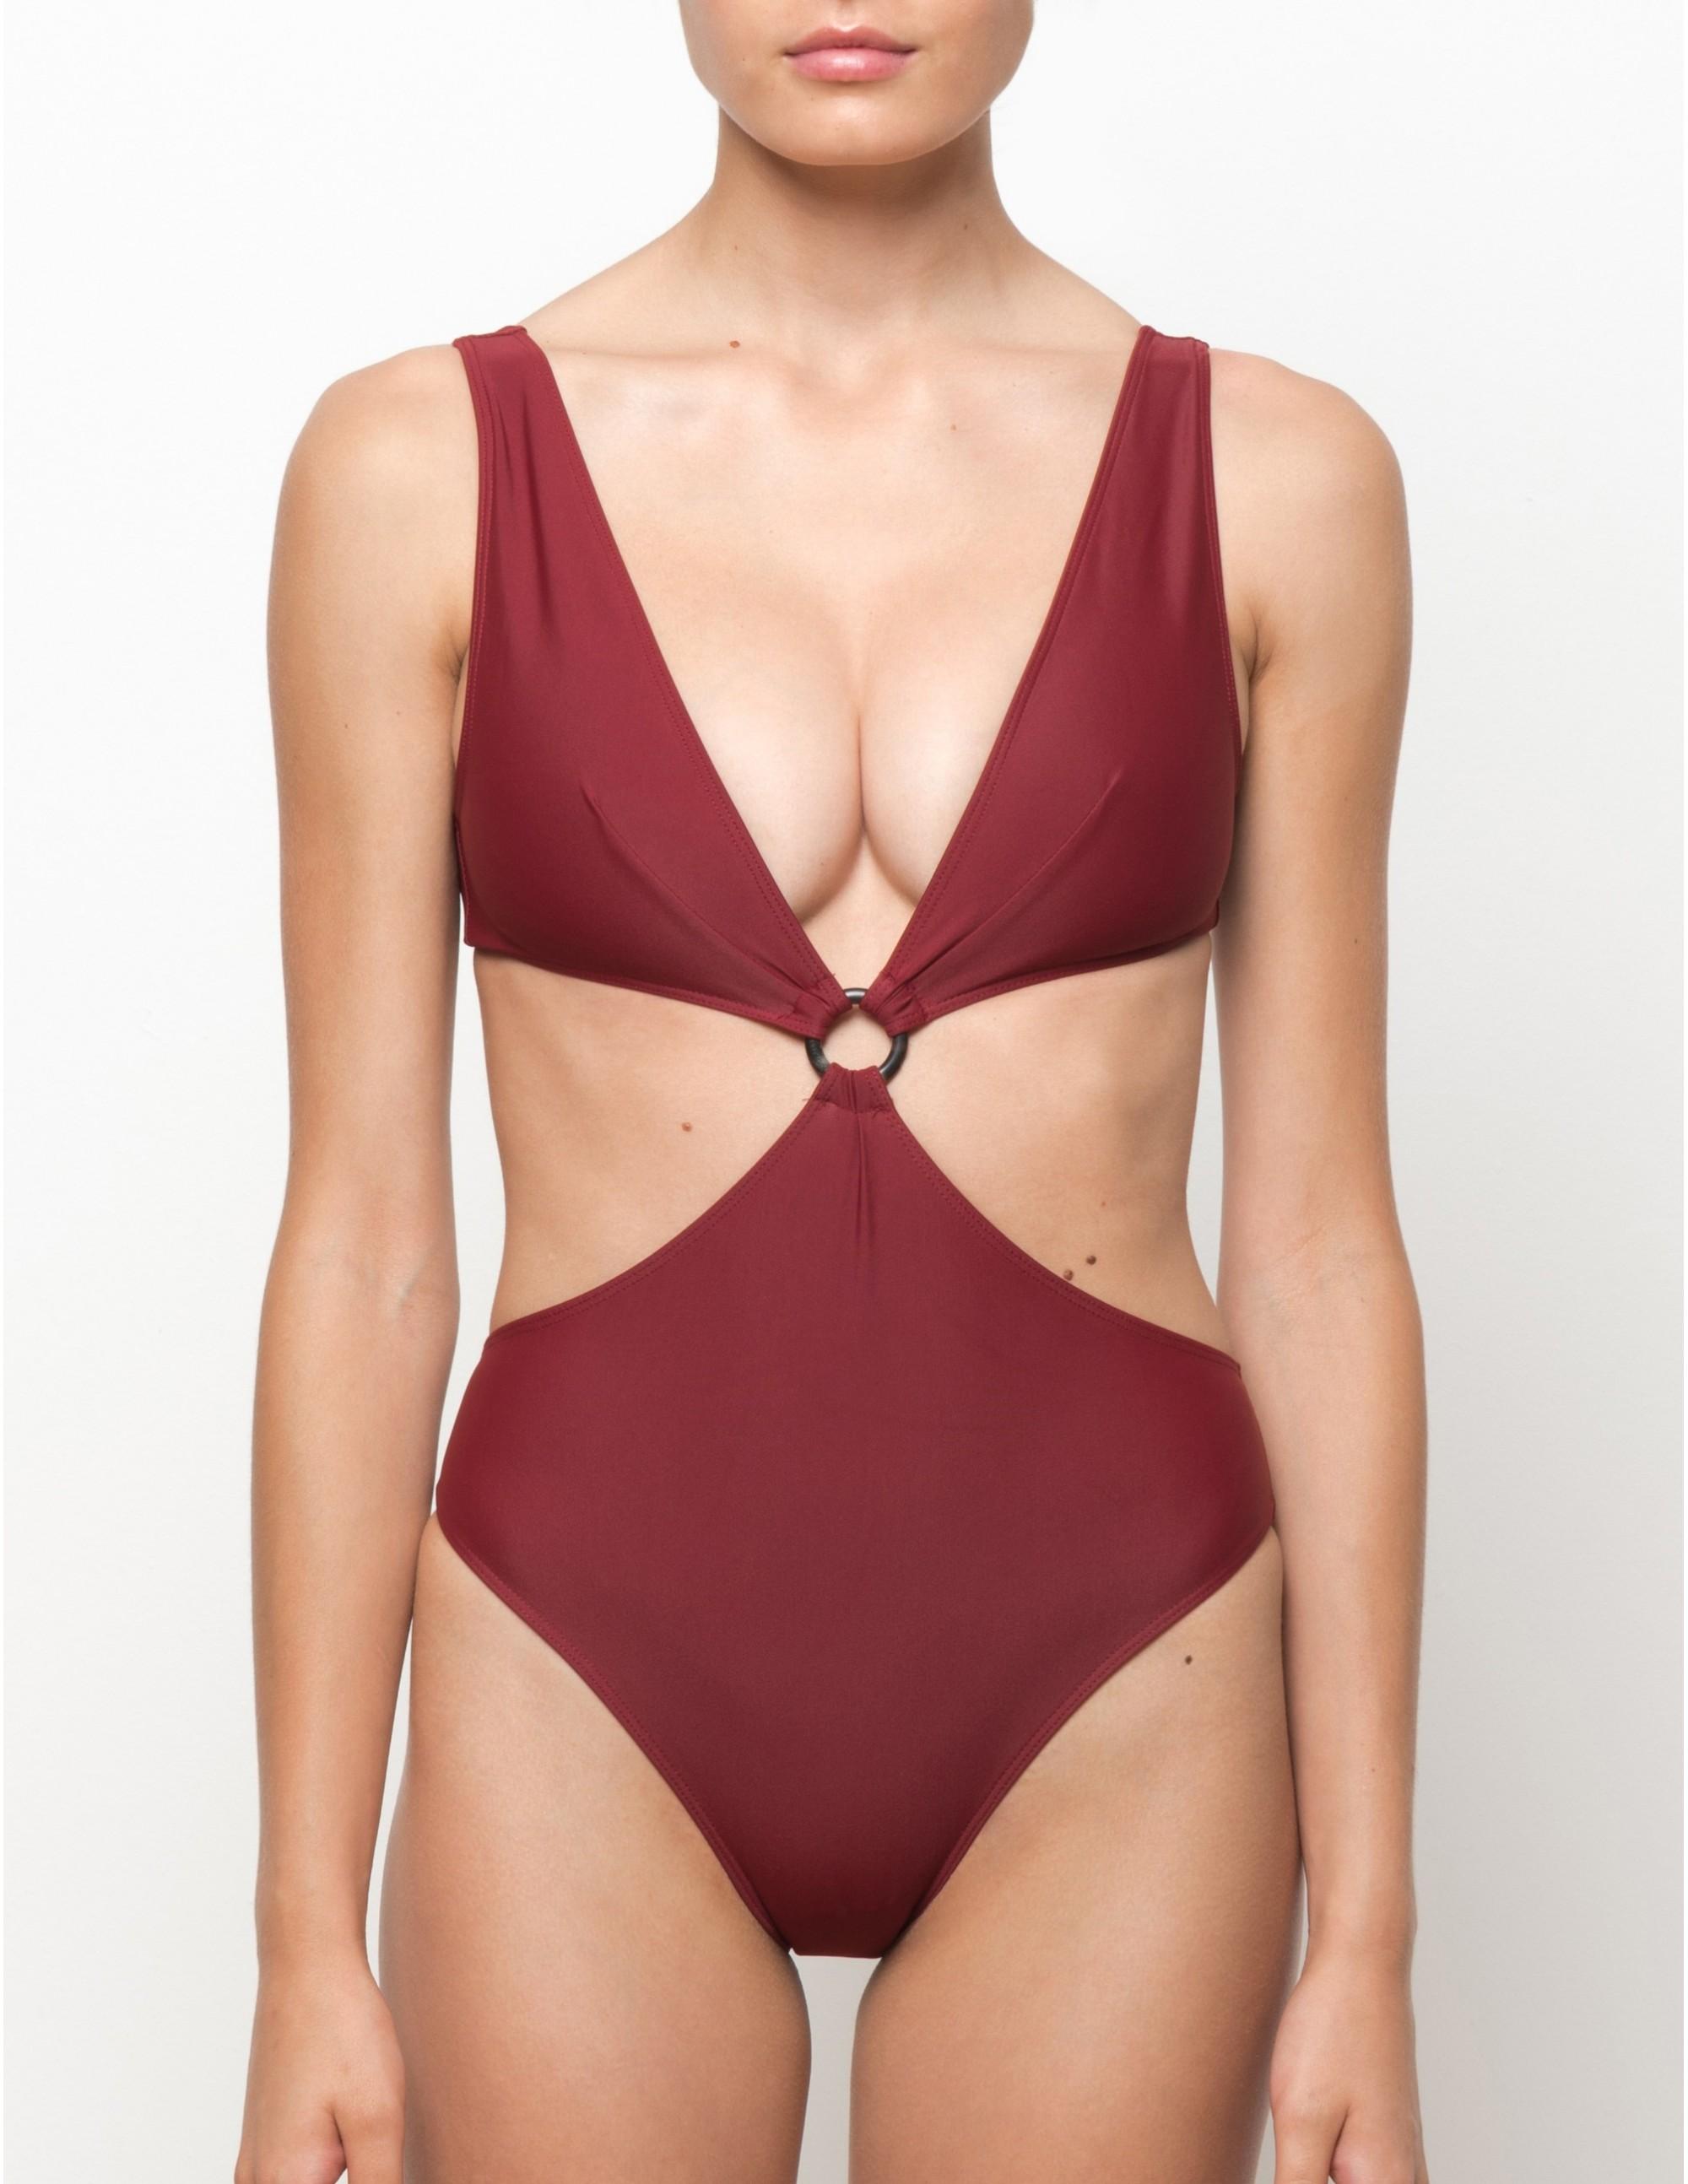 KILWA swimsuit - MASAAI